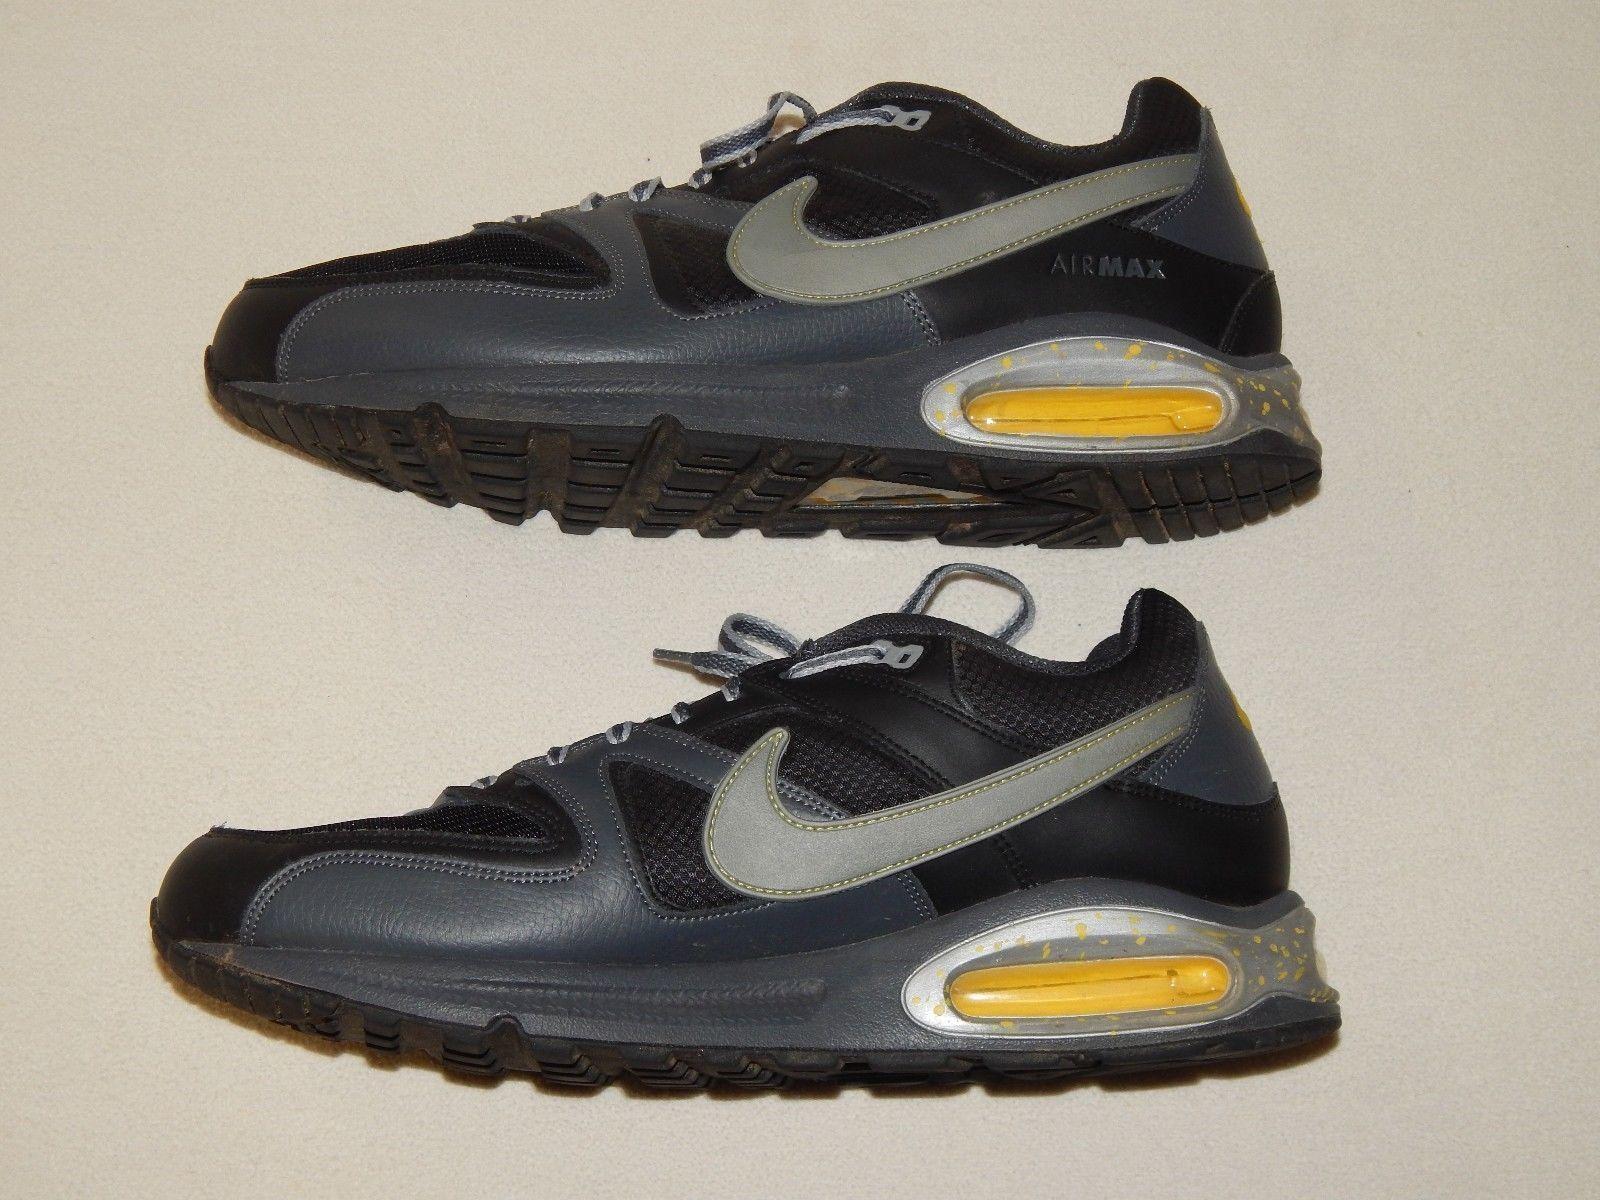 NIKE Air Max Command Sneaker 90 95 97 Gr:40 Premium Schuhe Black/yellow